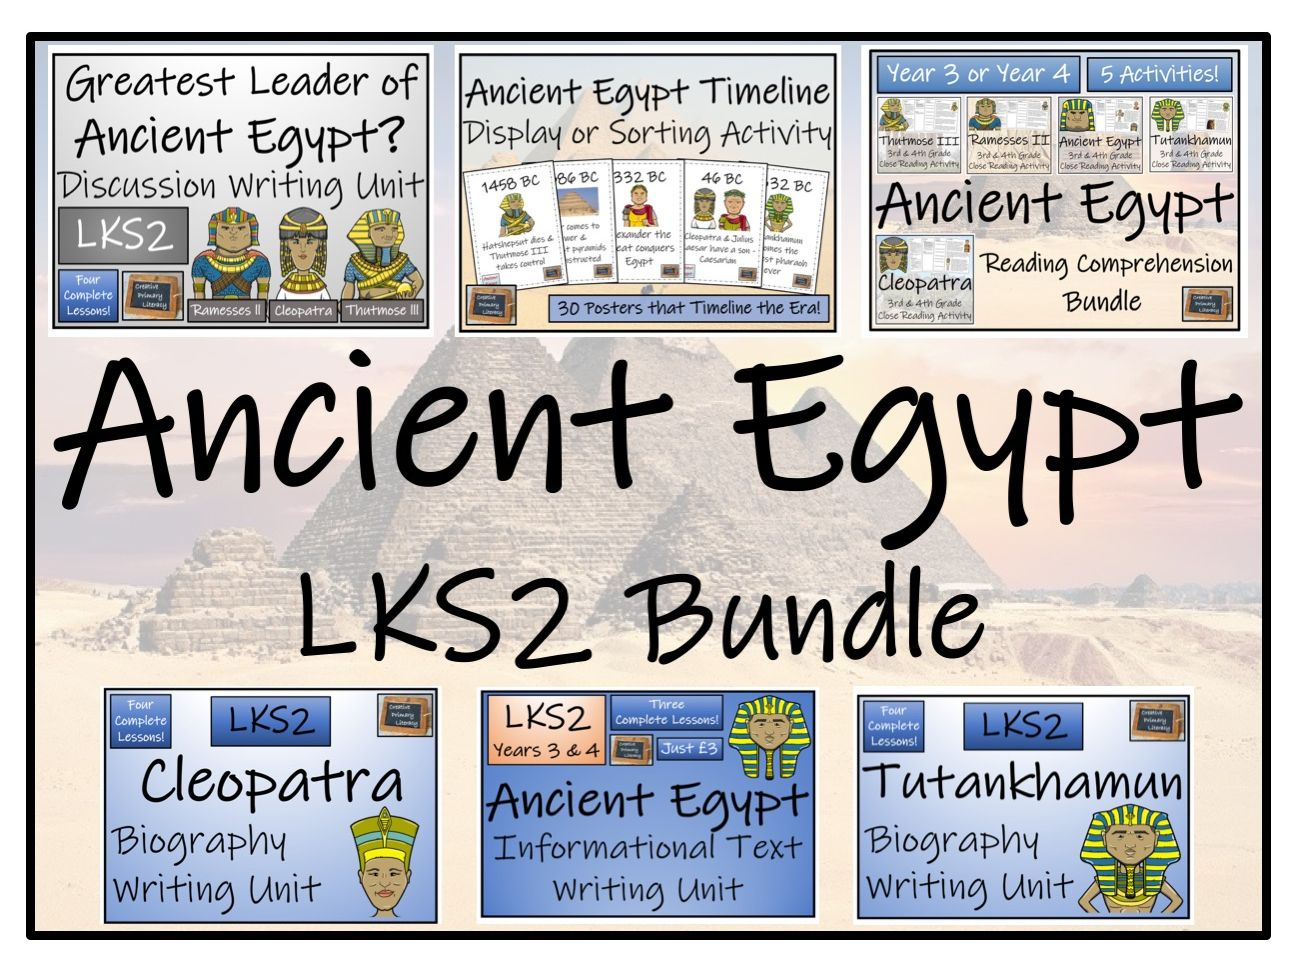 LKS2 Ancient Egypt Reading Comprehension & Writing Bundle